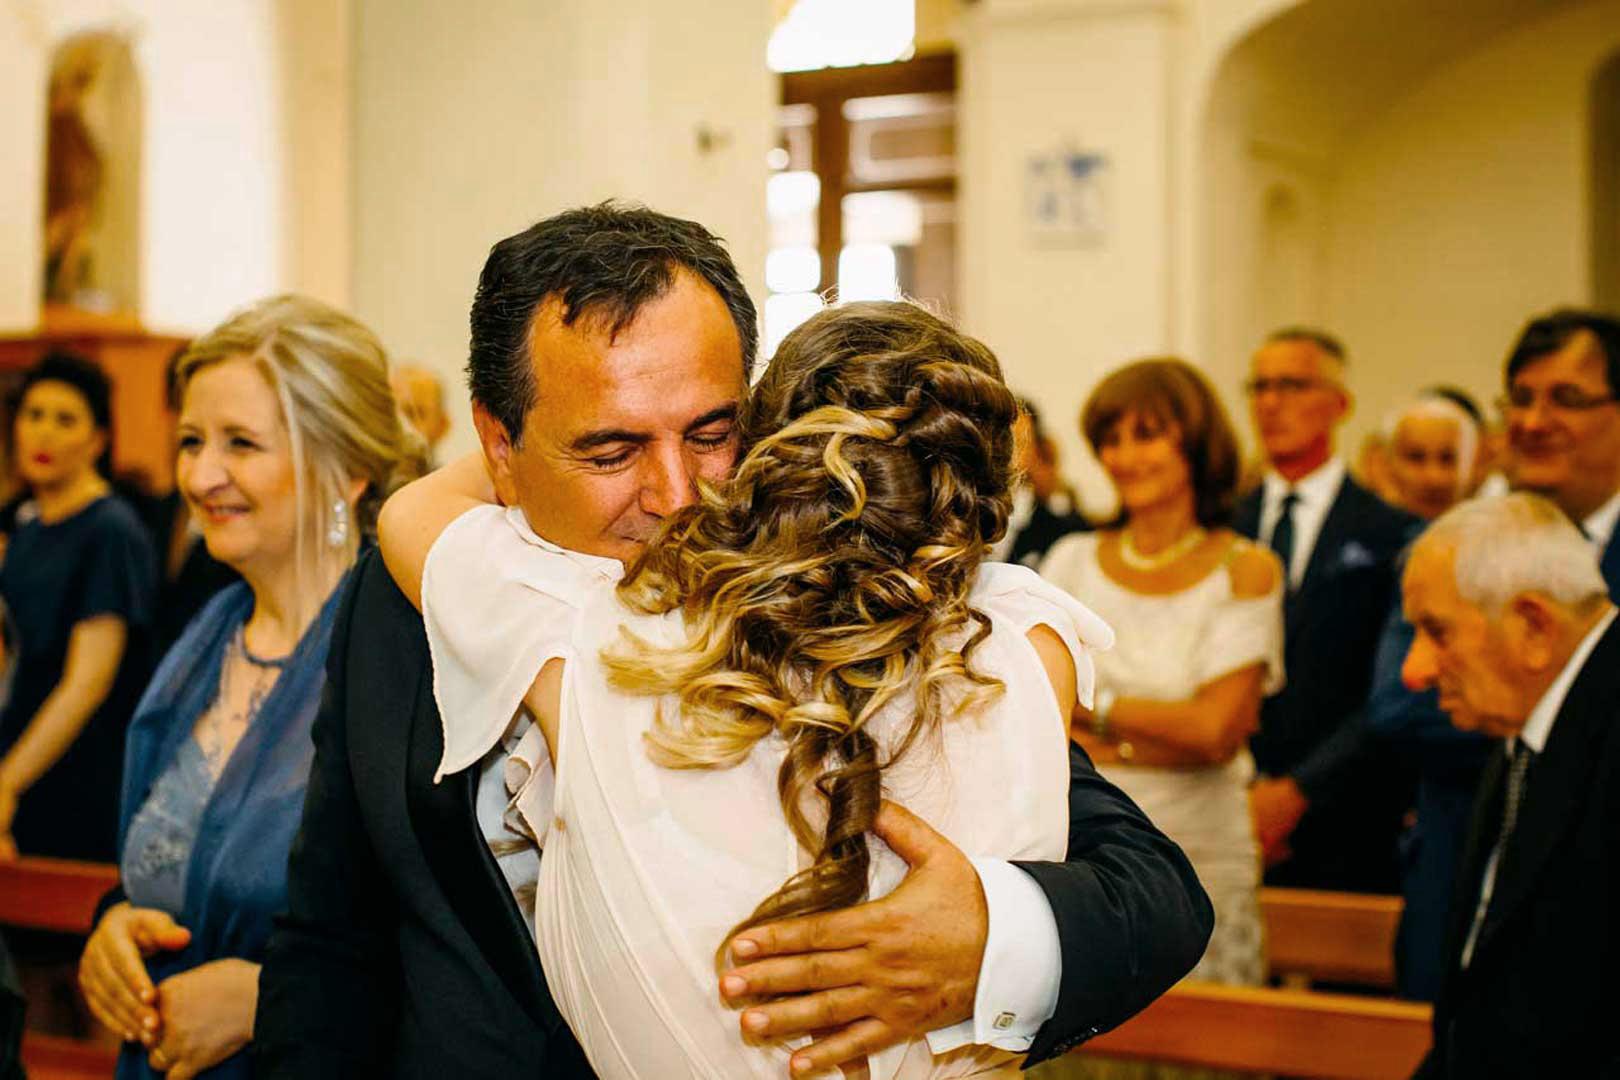 021-matrimonio-emozionante-gianni-lepore-fotografo-lucera